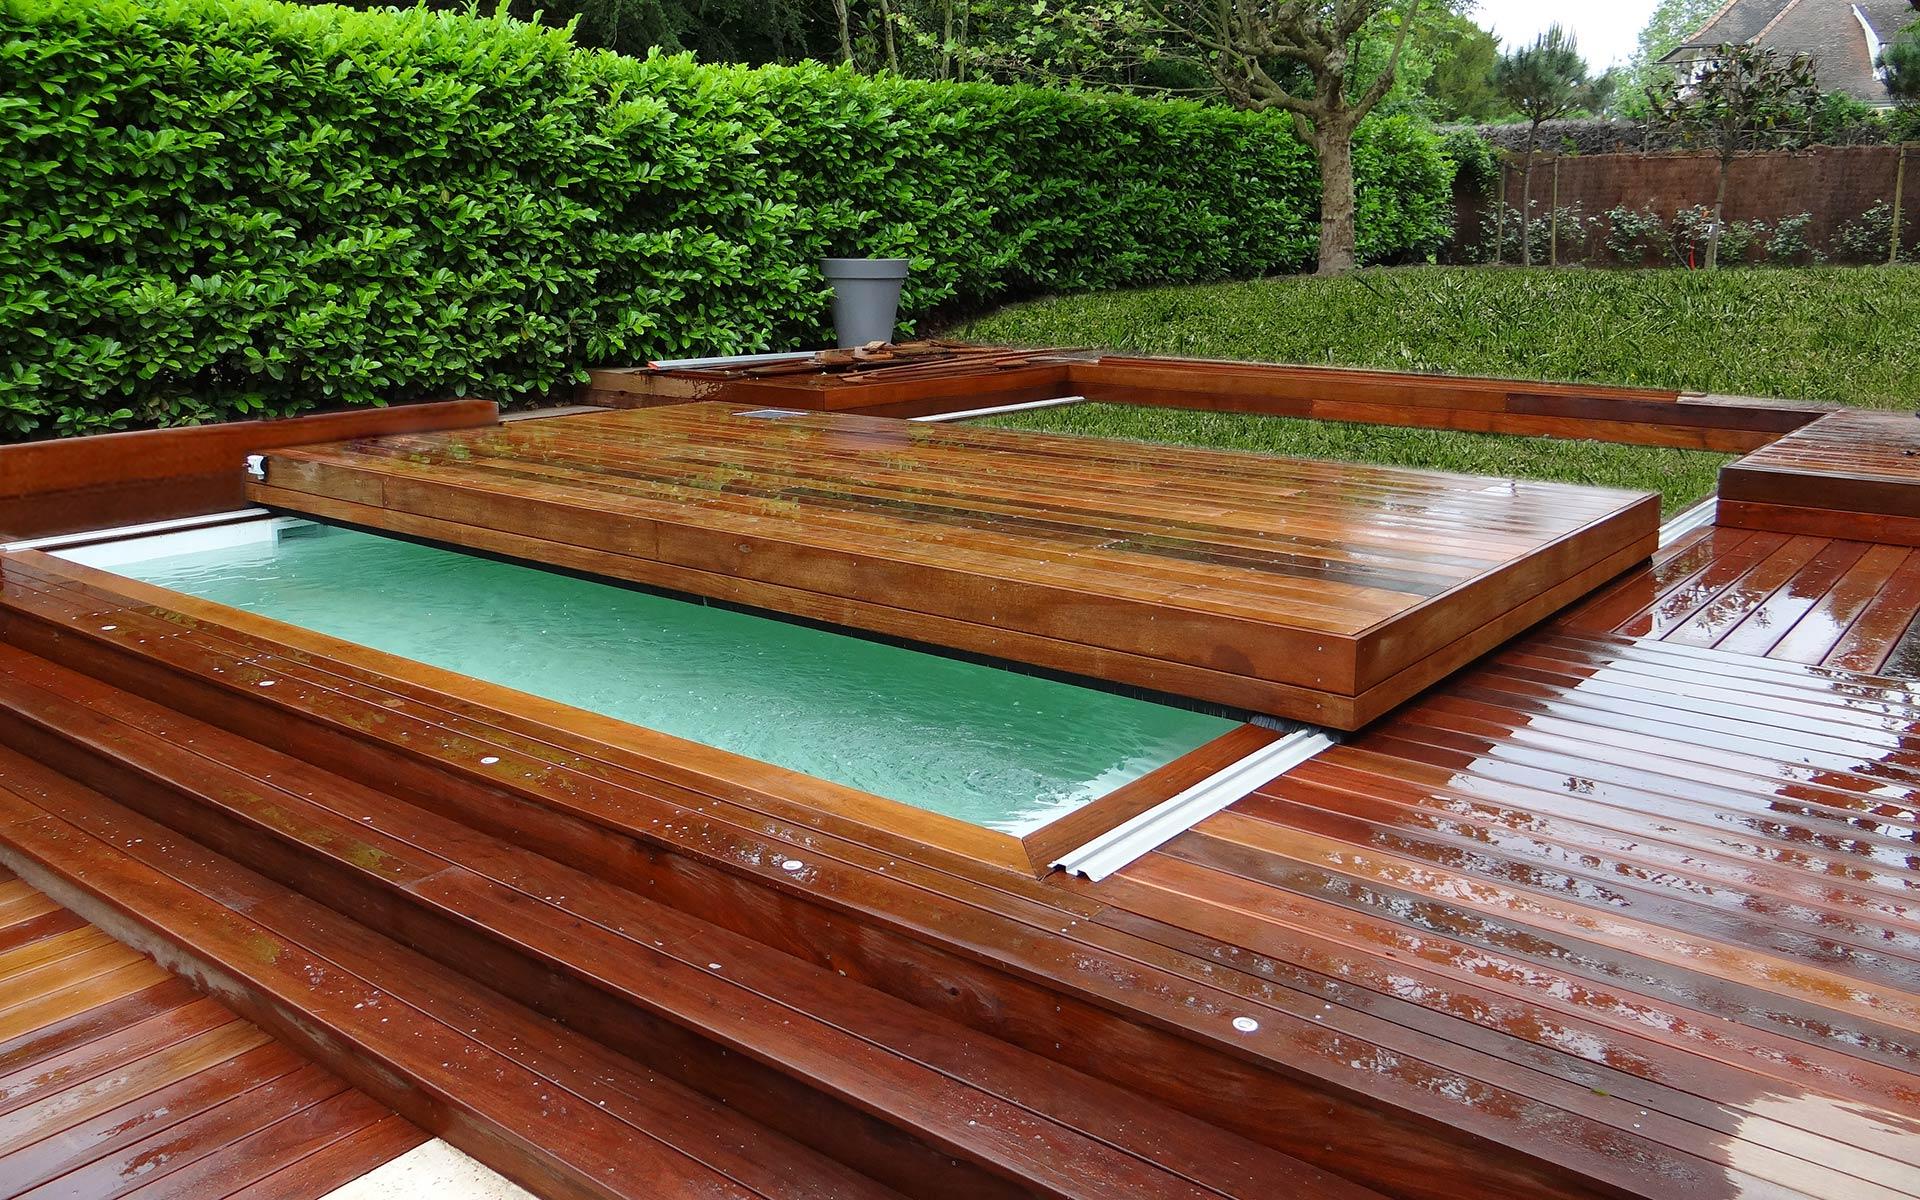 Terrasse bois amovible nos conseils for Realiser une terrasse